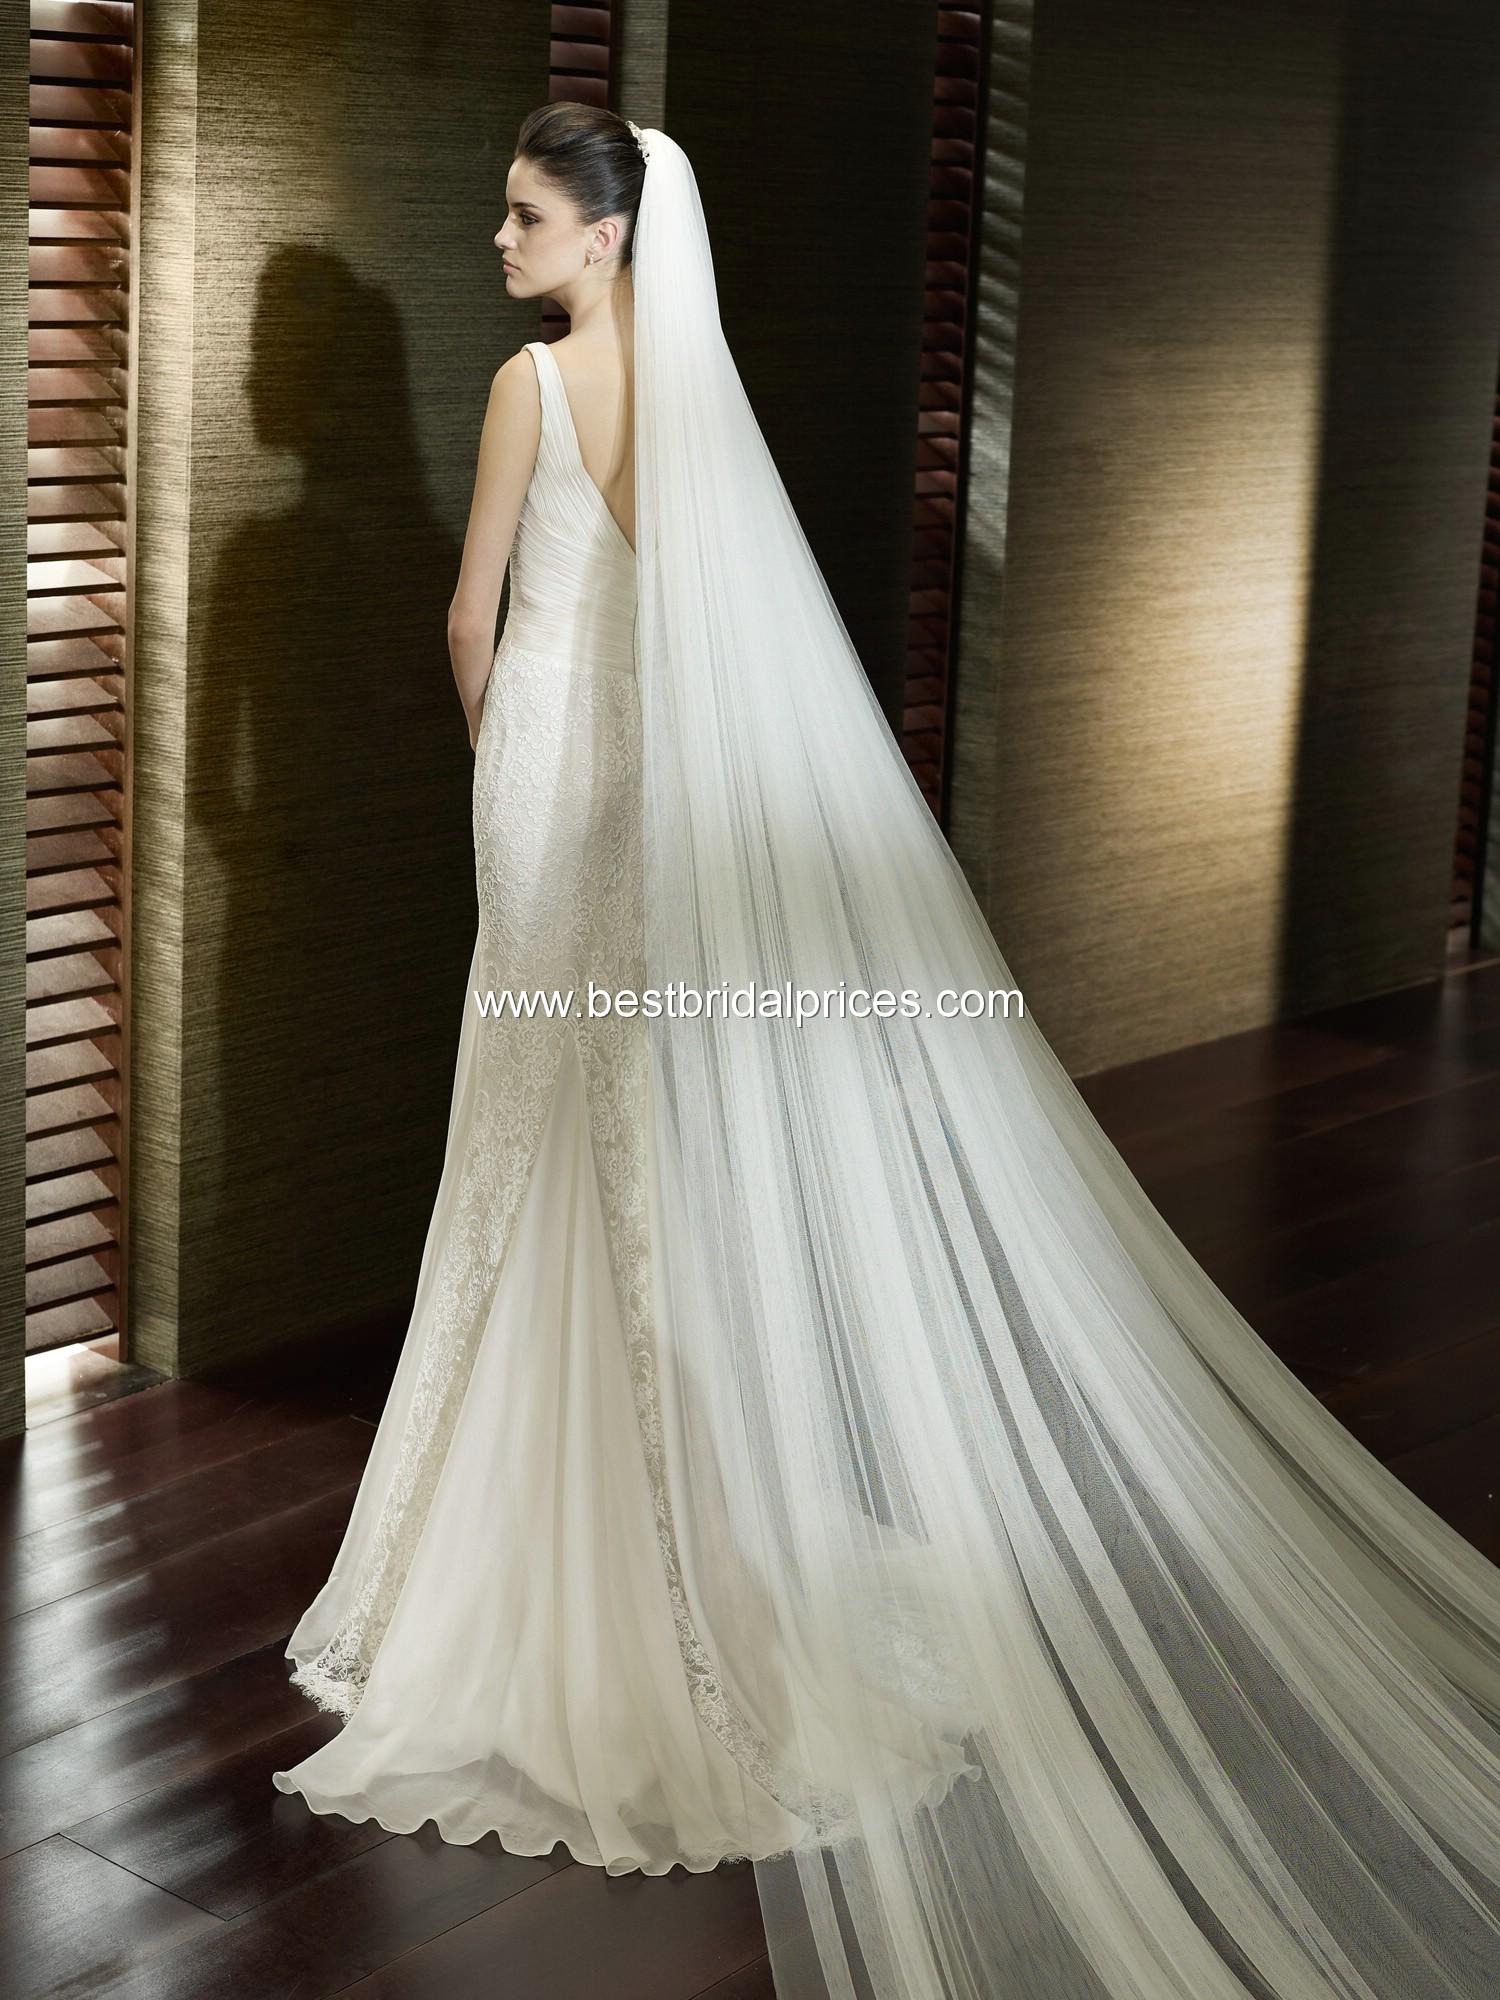 sanpatrick wedding dresses photo - 1